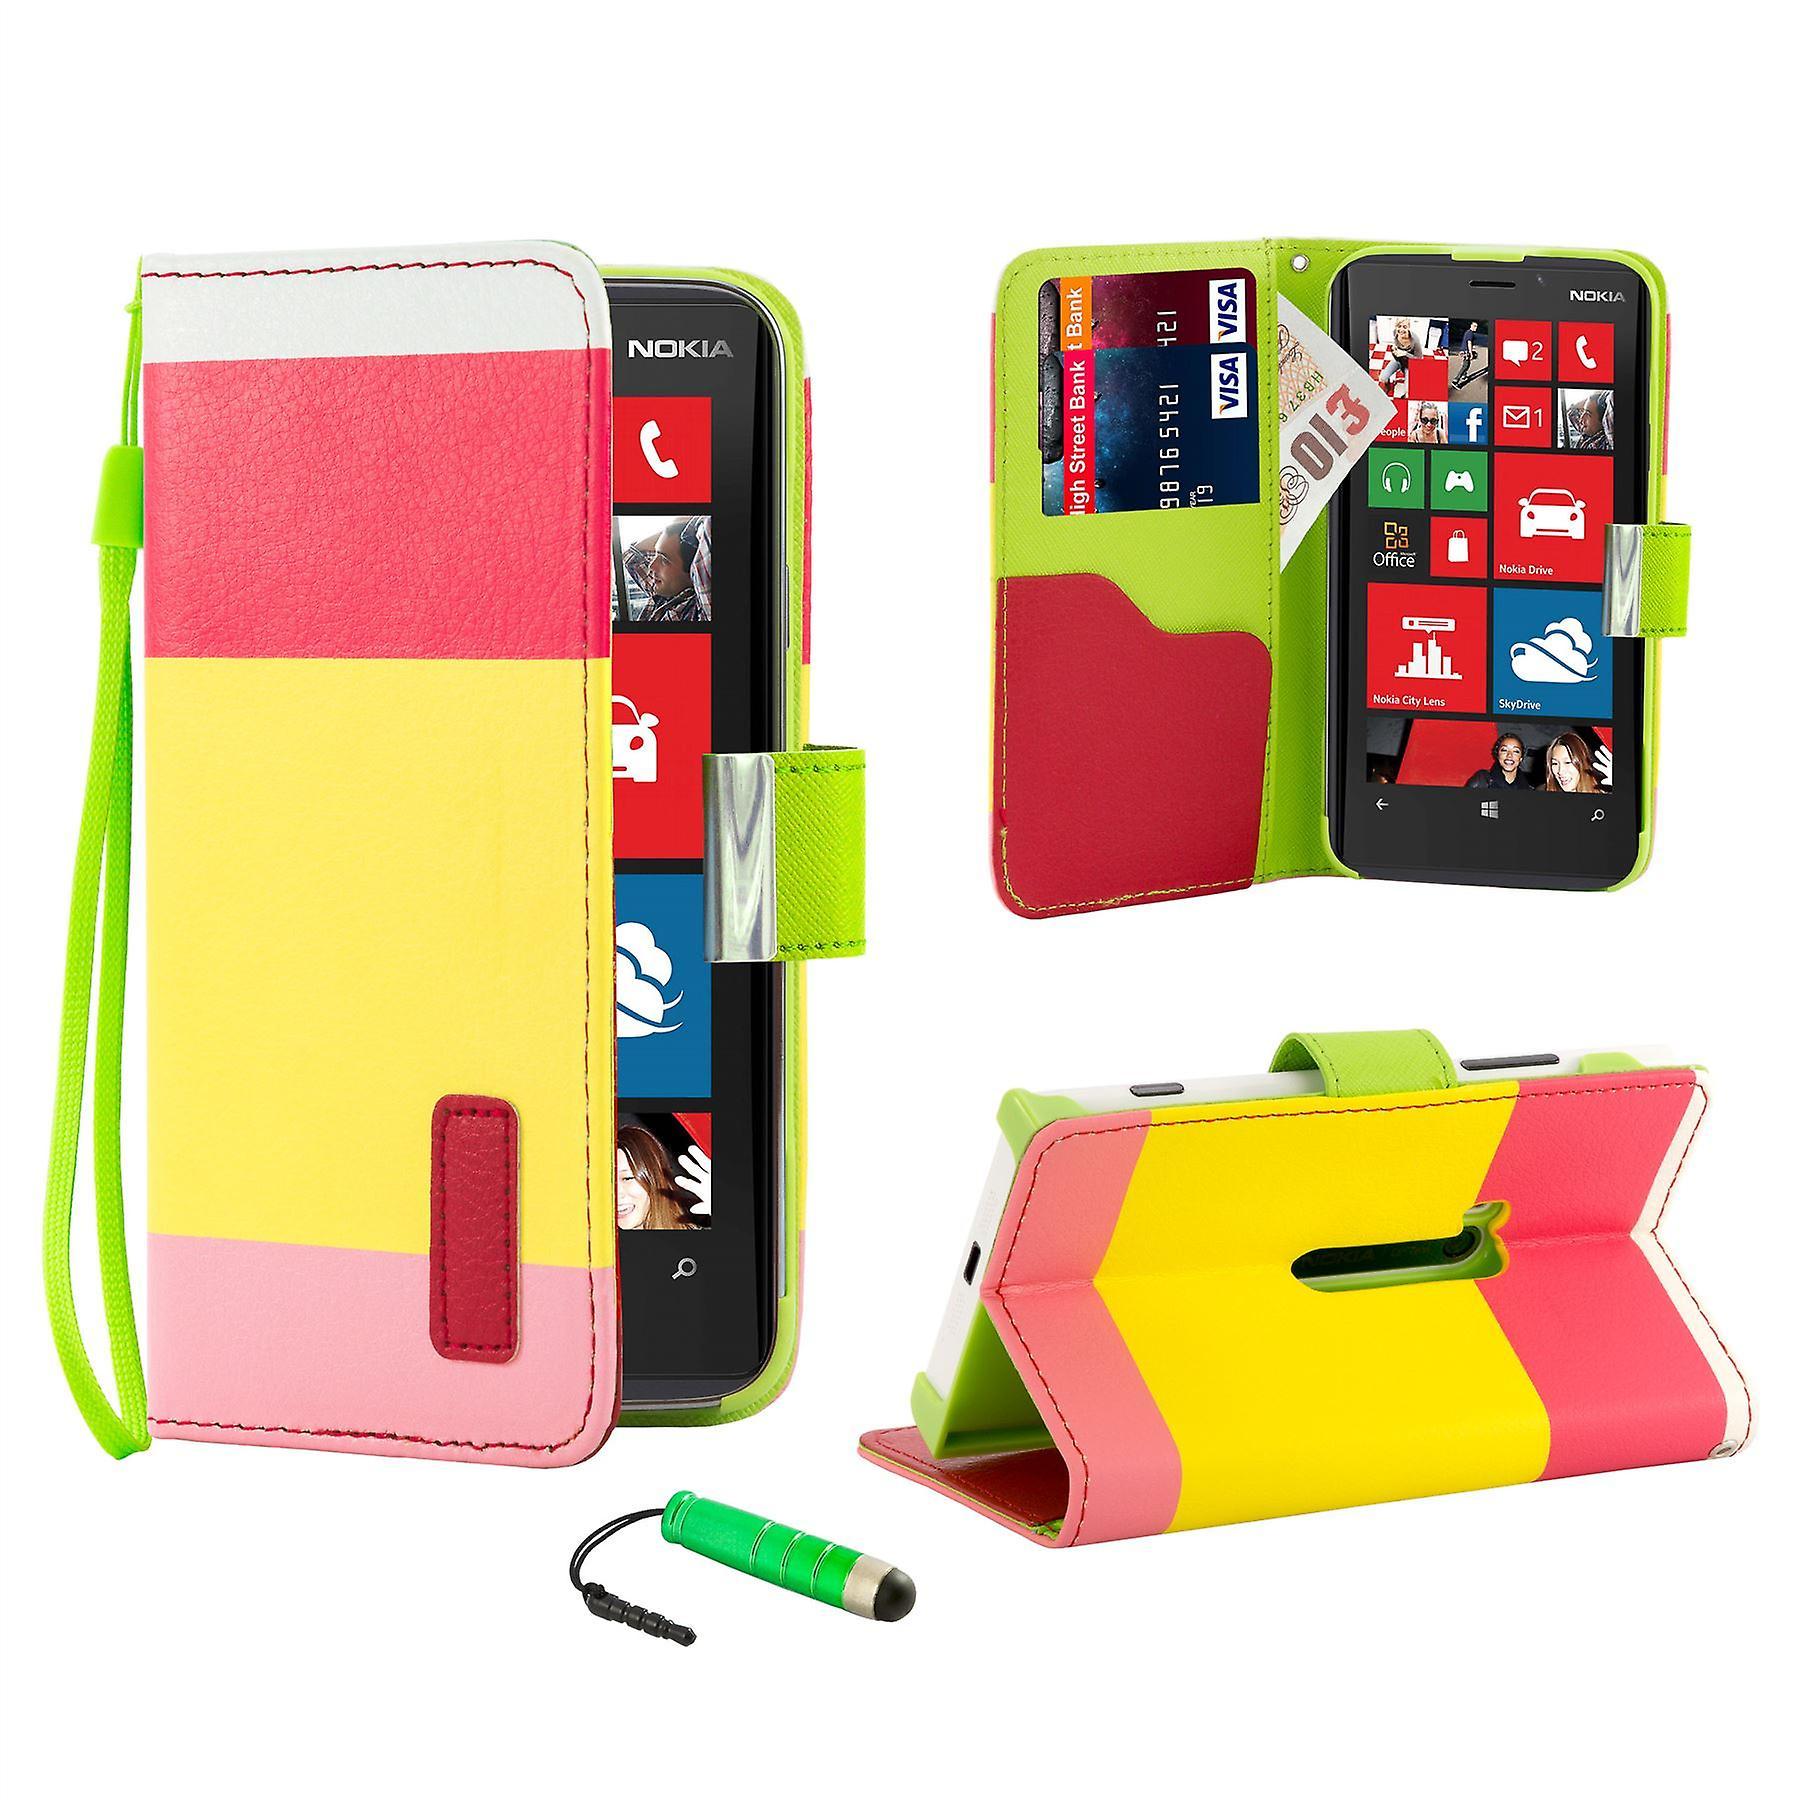 Multiple Stripe wallet case + stylus for Nokia Lumia 920 - Hot Pink